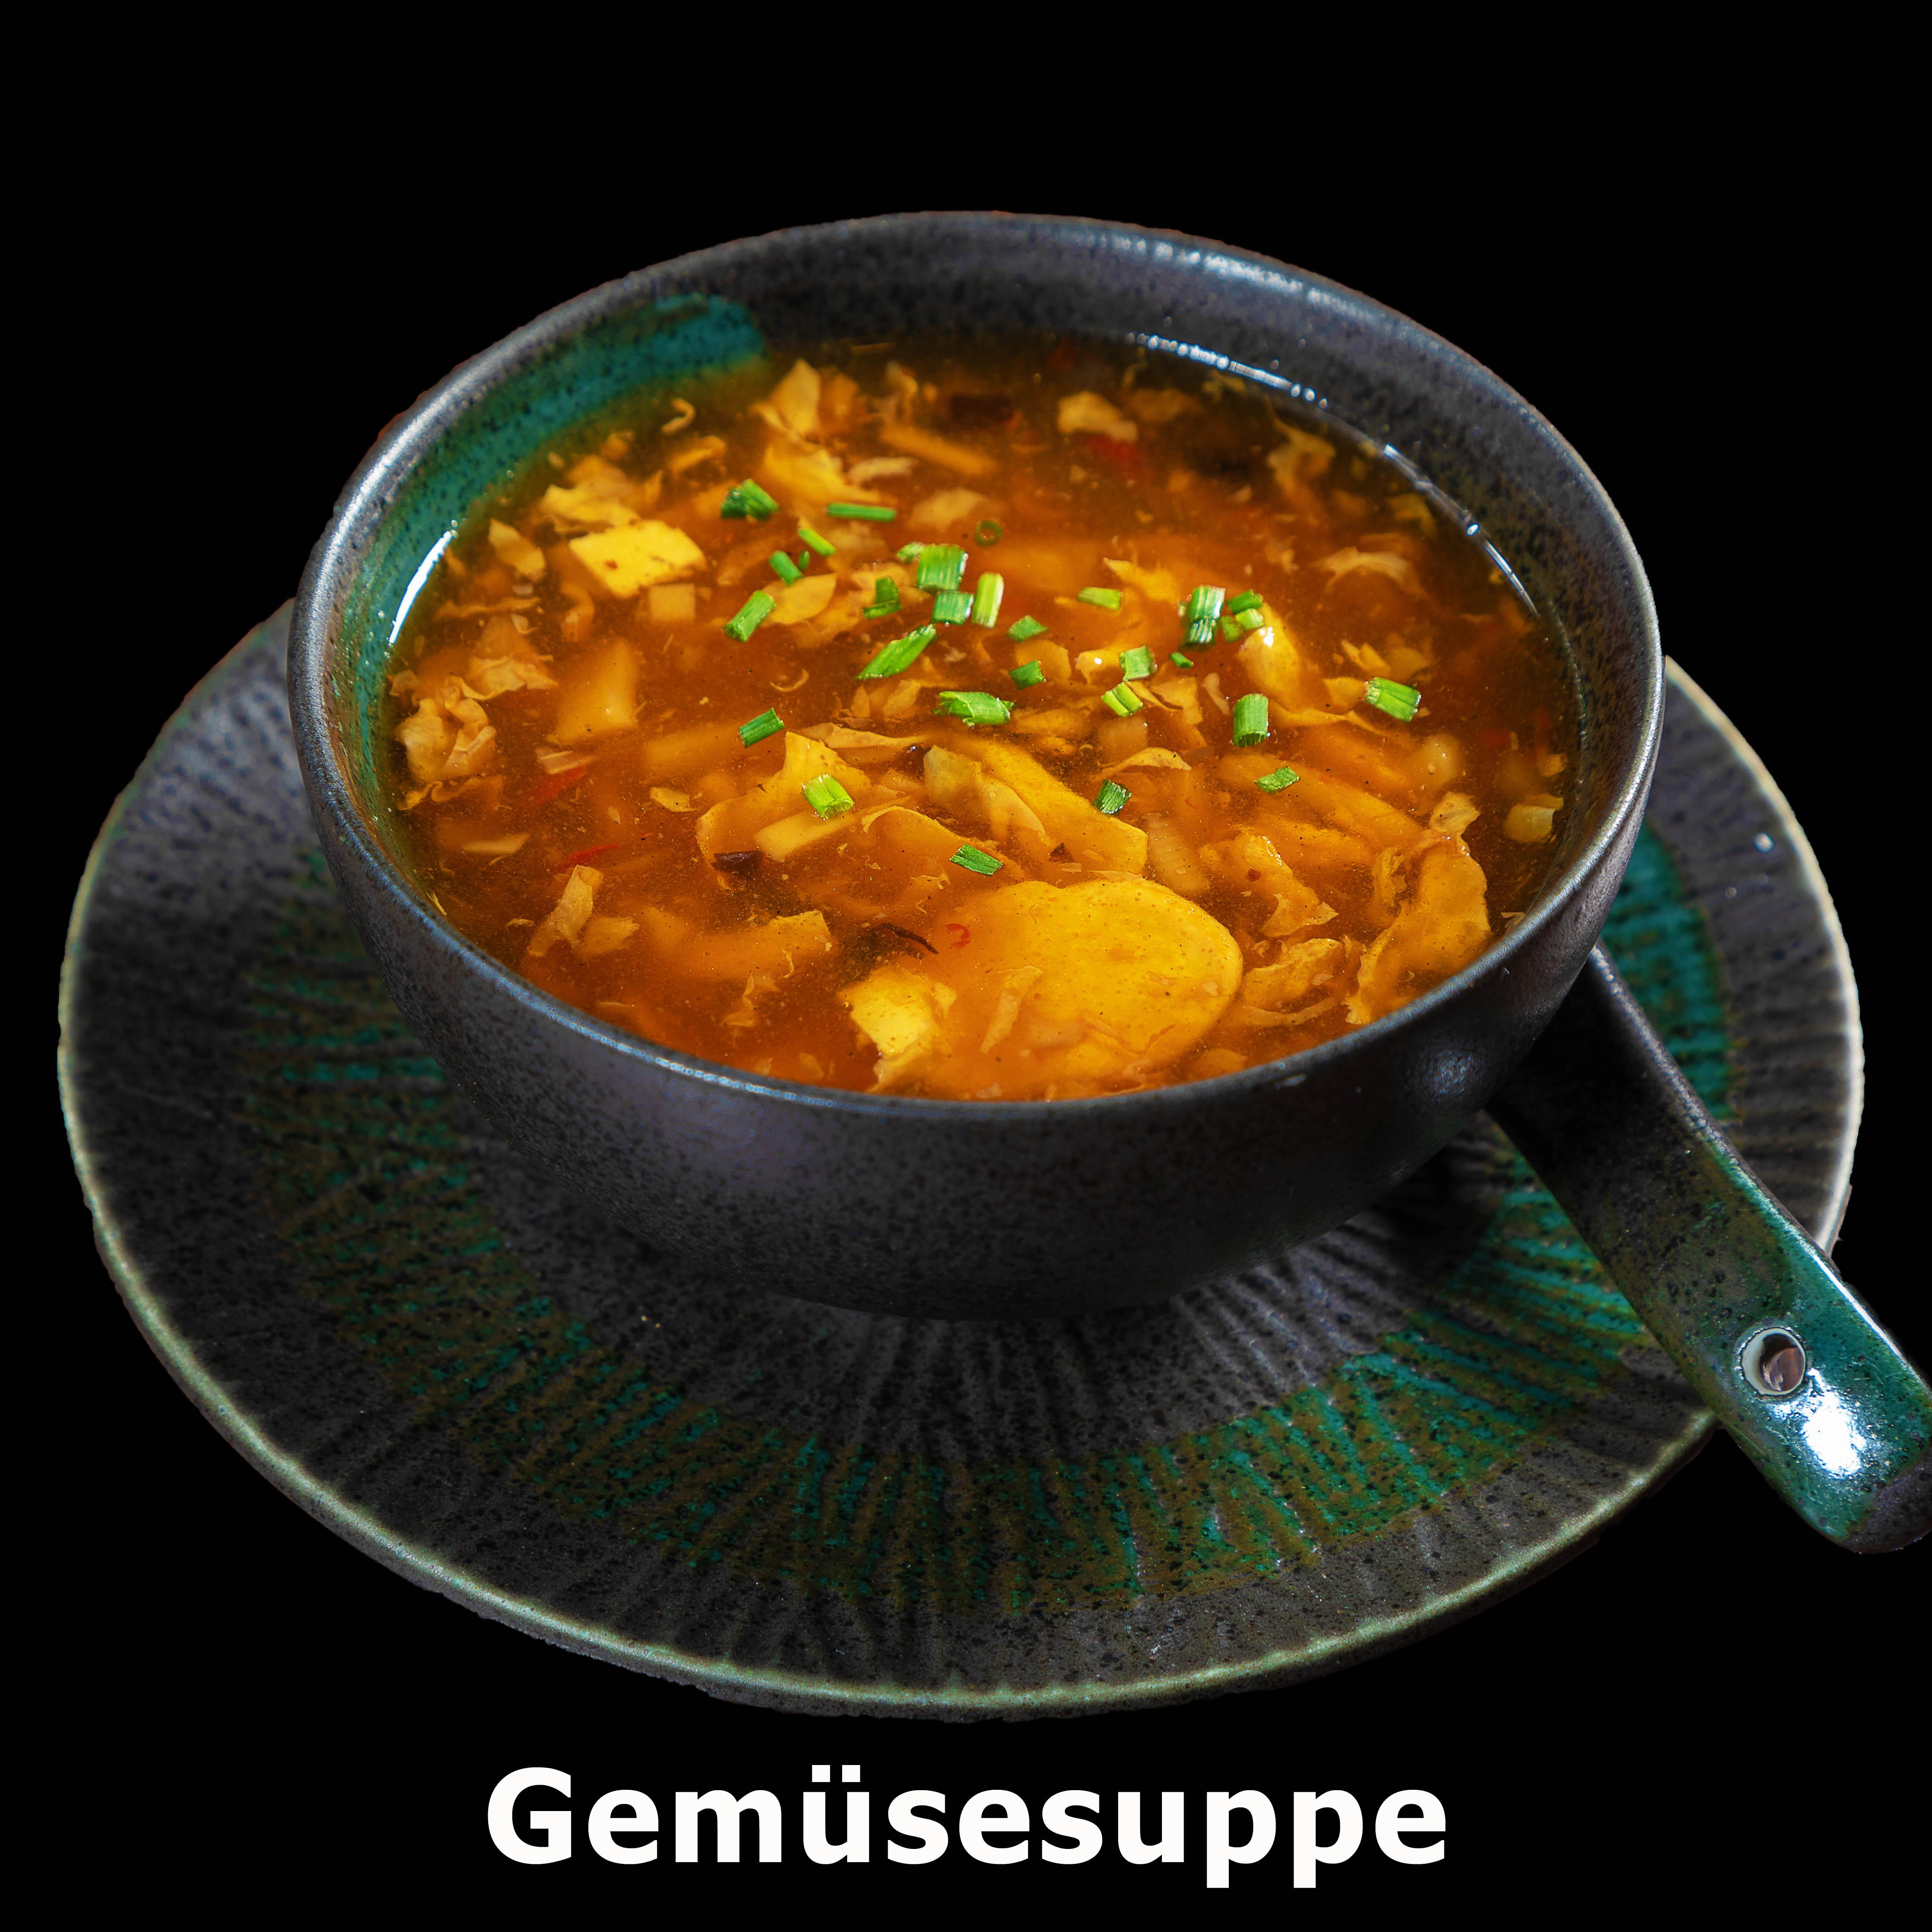 1. Gemüsesuppe